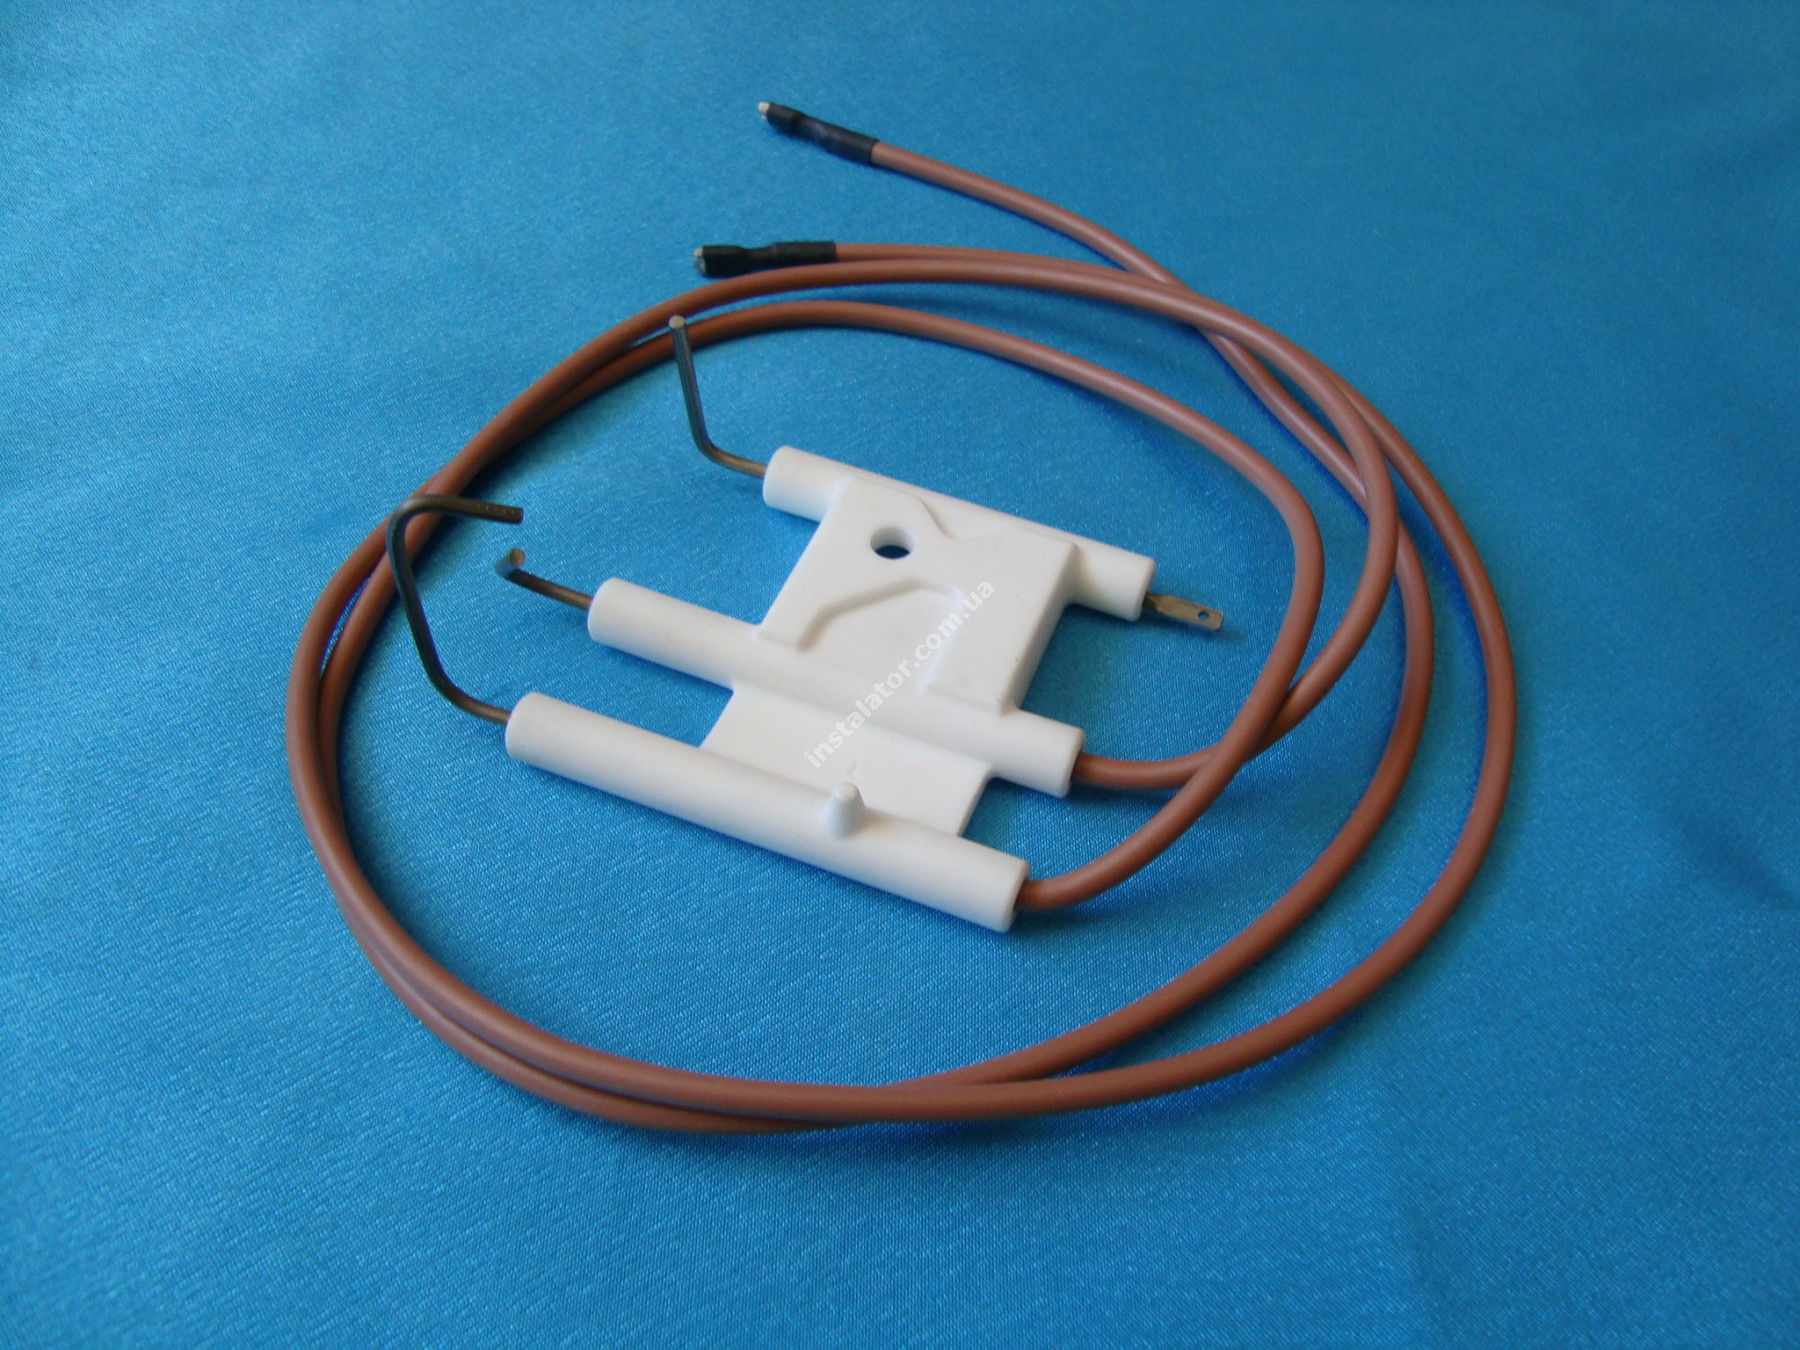 0020039057 Група електродів  VAILLANT atmoTec, turboTec Pro\Plus   full-image-1